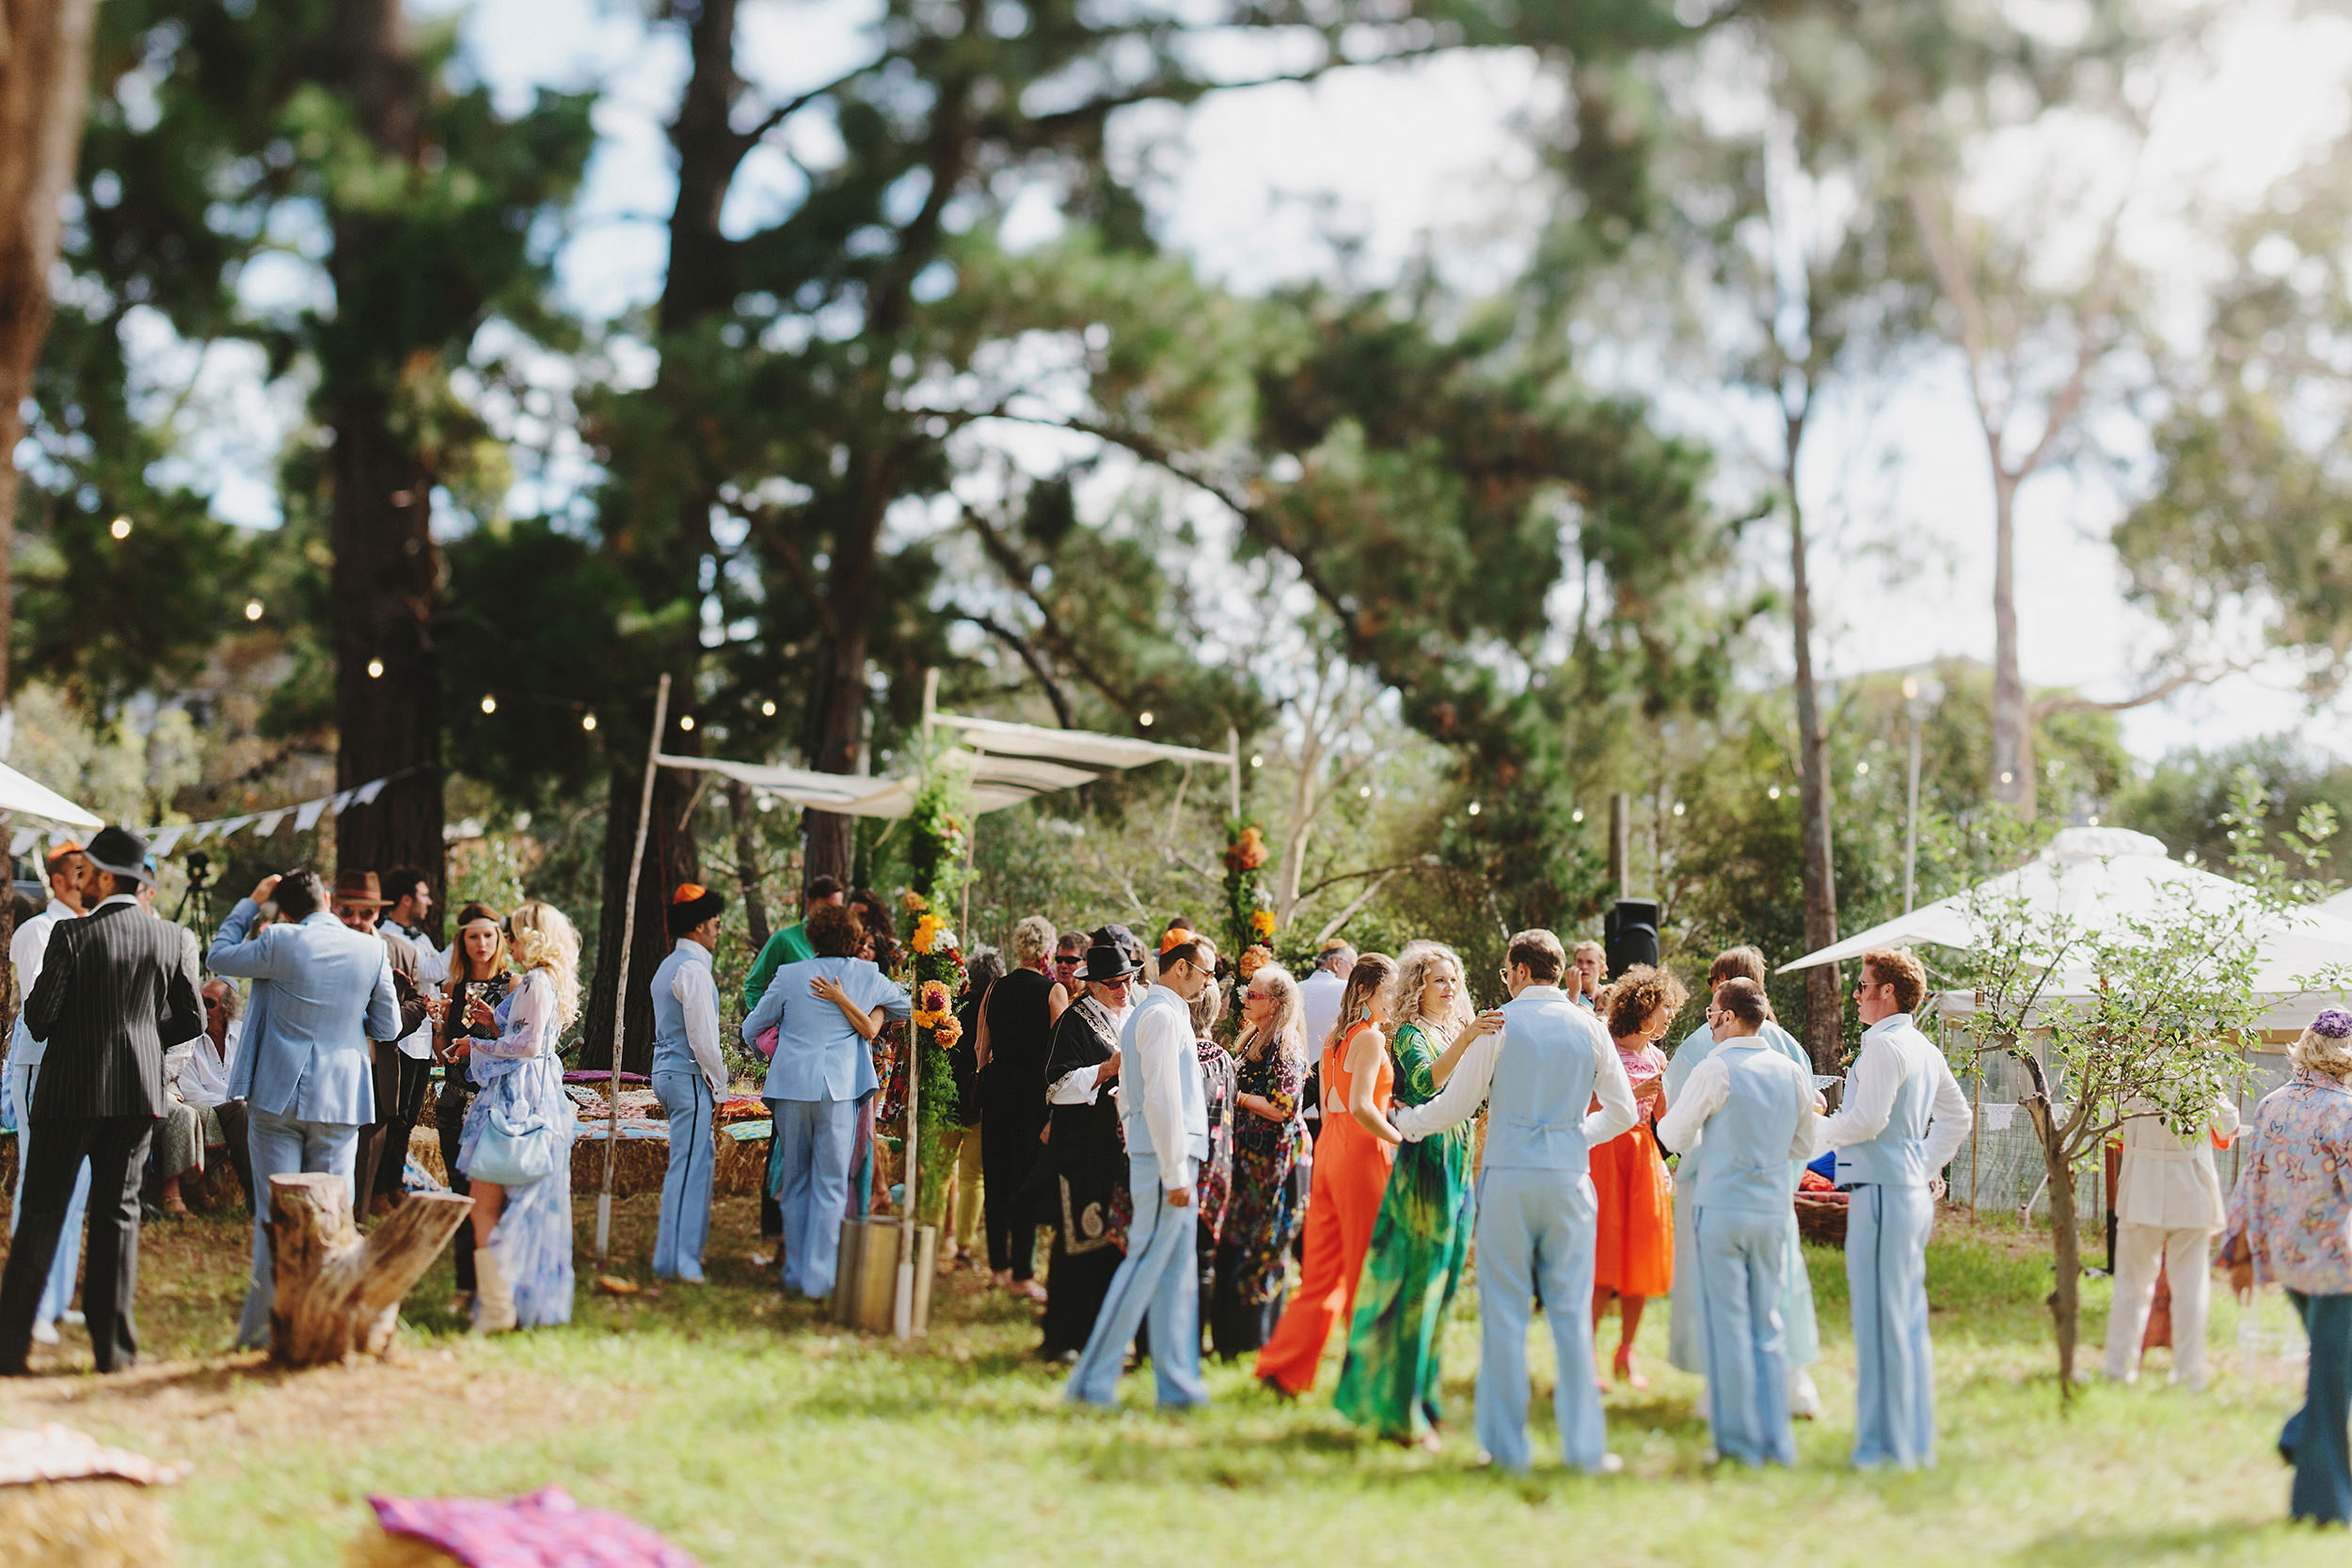 Melbourne_Vintage_Backyard_Wedding_Ben_Erin 044.JPG